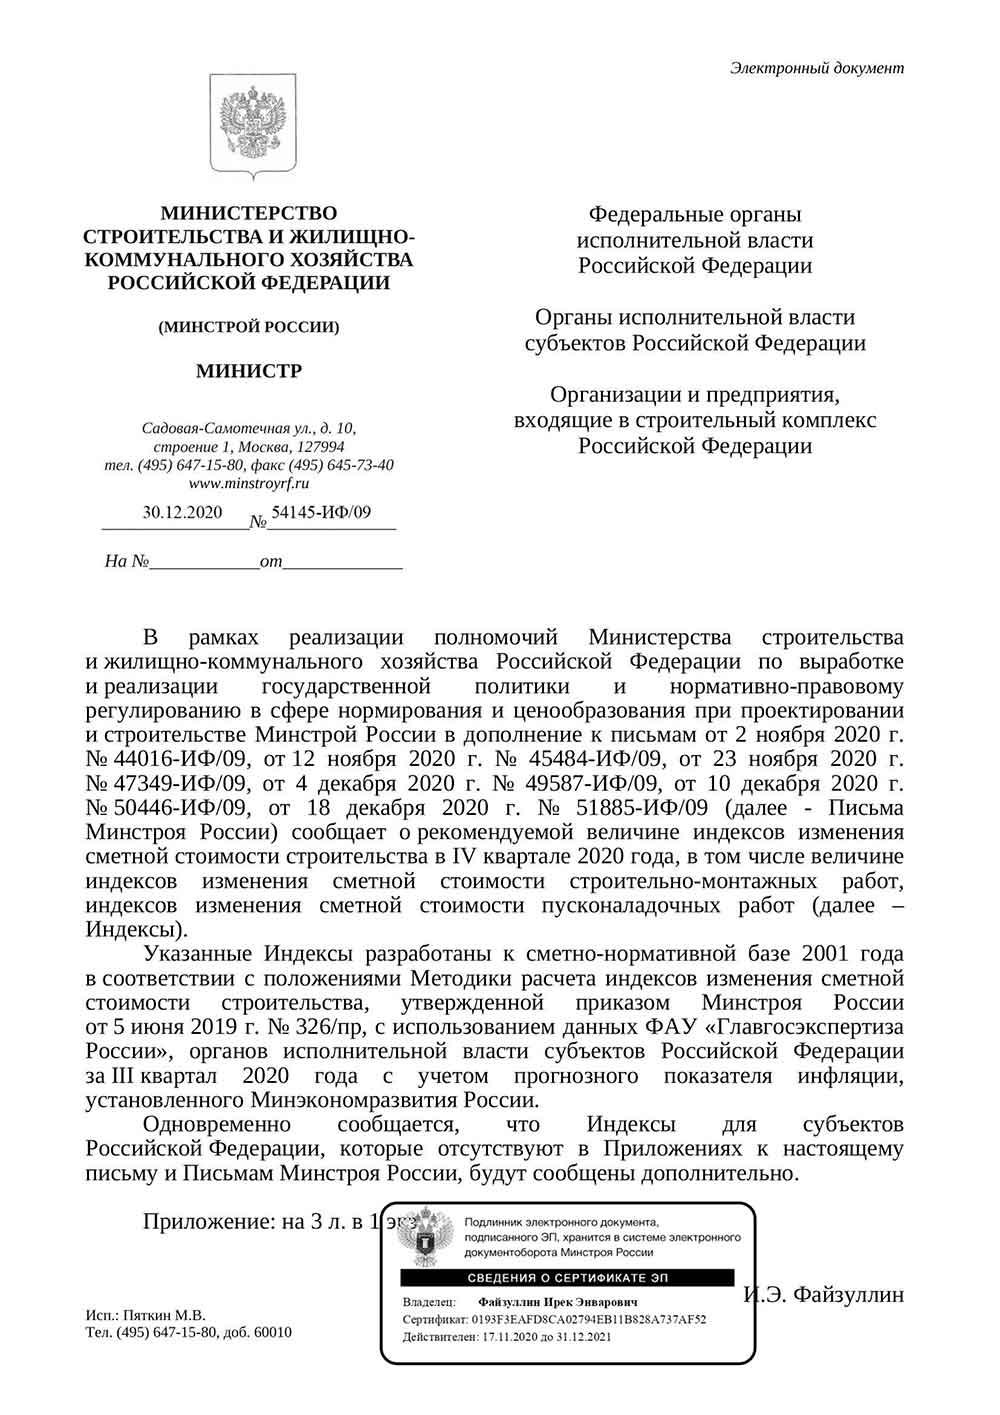 Письмо Минстроя РФ №54145-ИФ/09 от 30.12.2020 г.